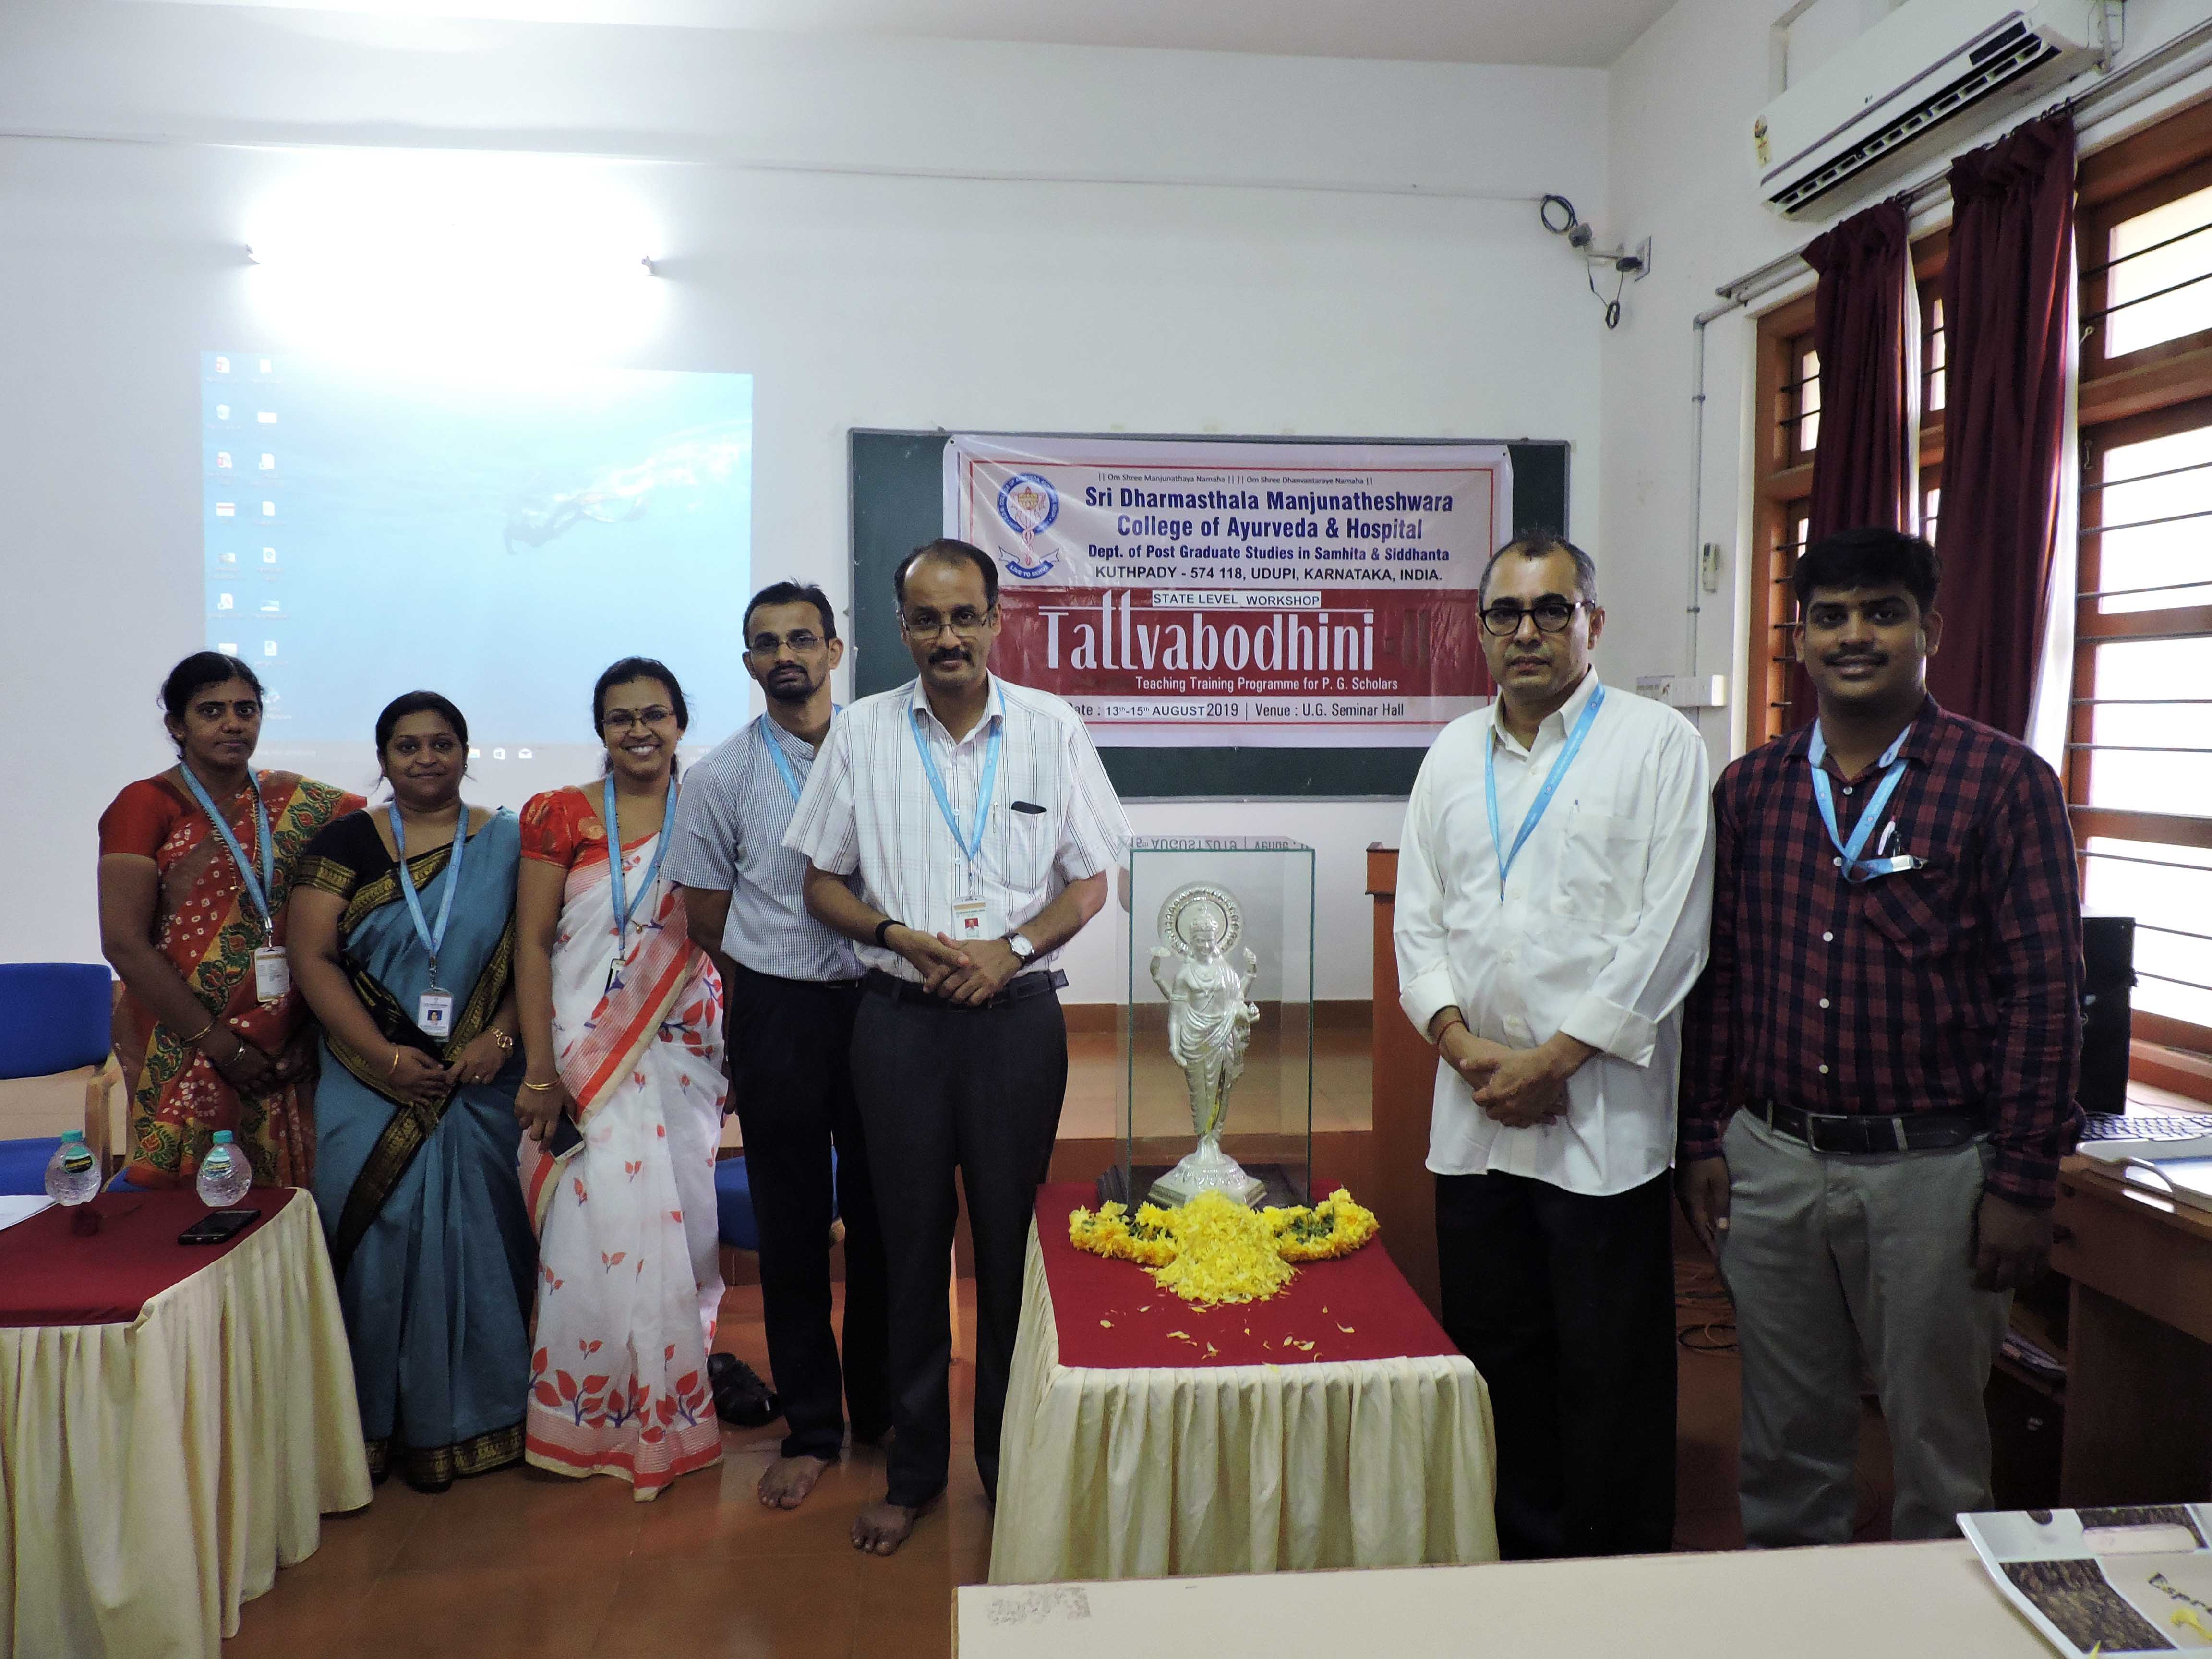 National workshop on 'Tattvabodhini'